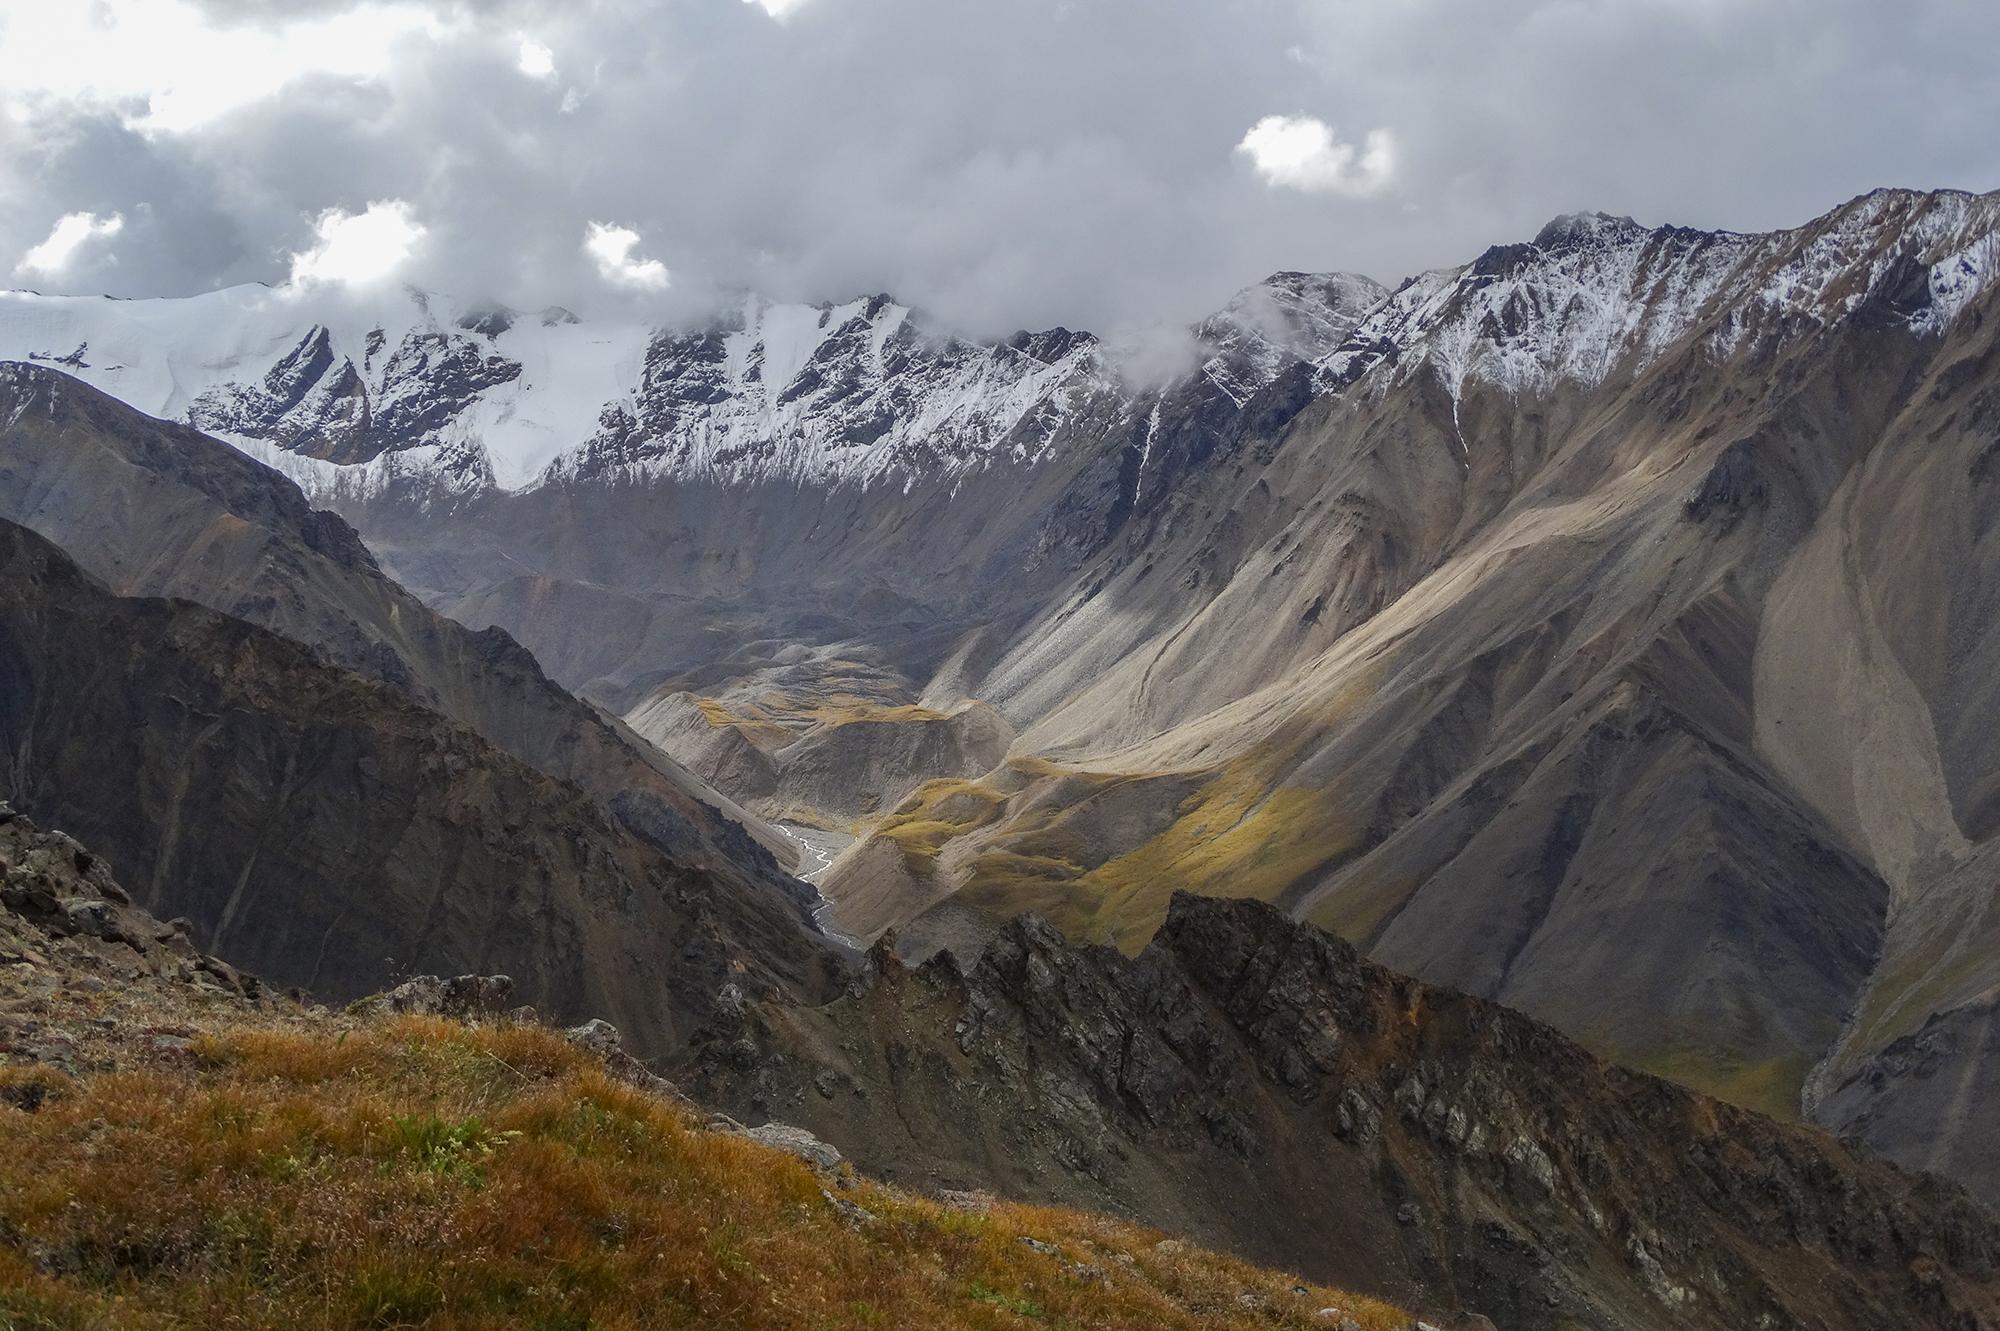 Donjek Route, Kluane National Park and Reserve, Yukon Territory, Canada